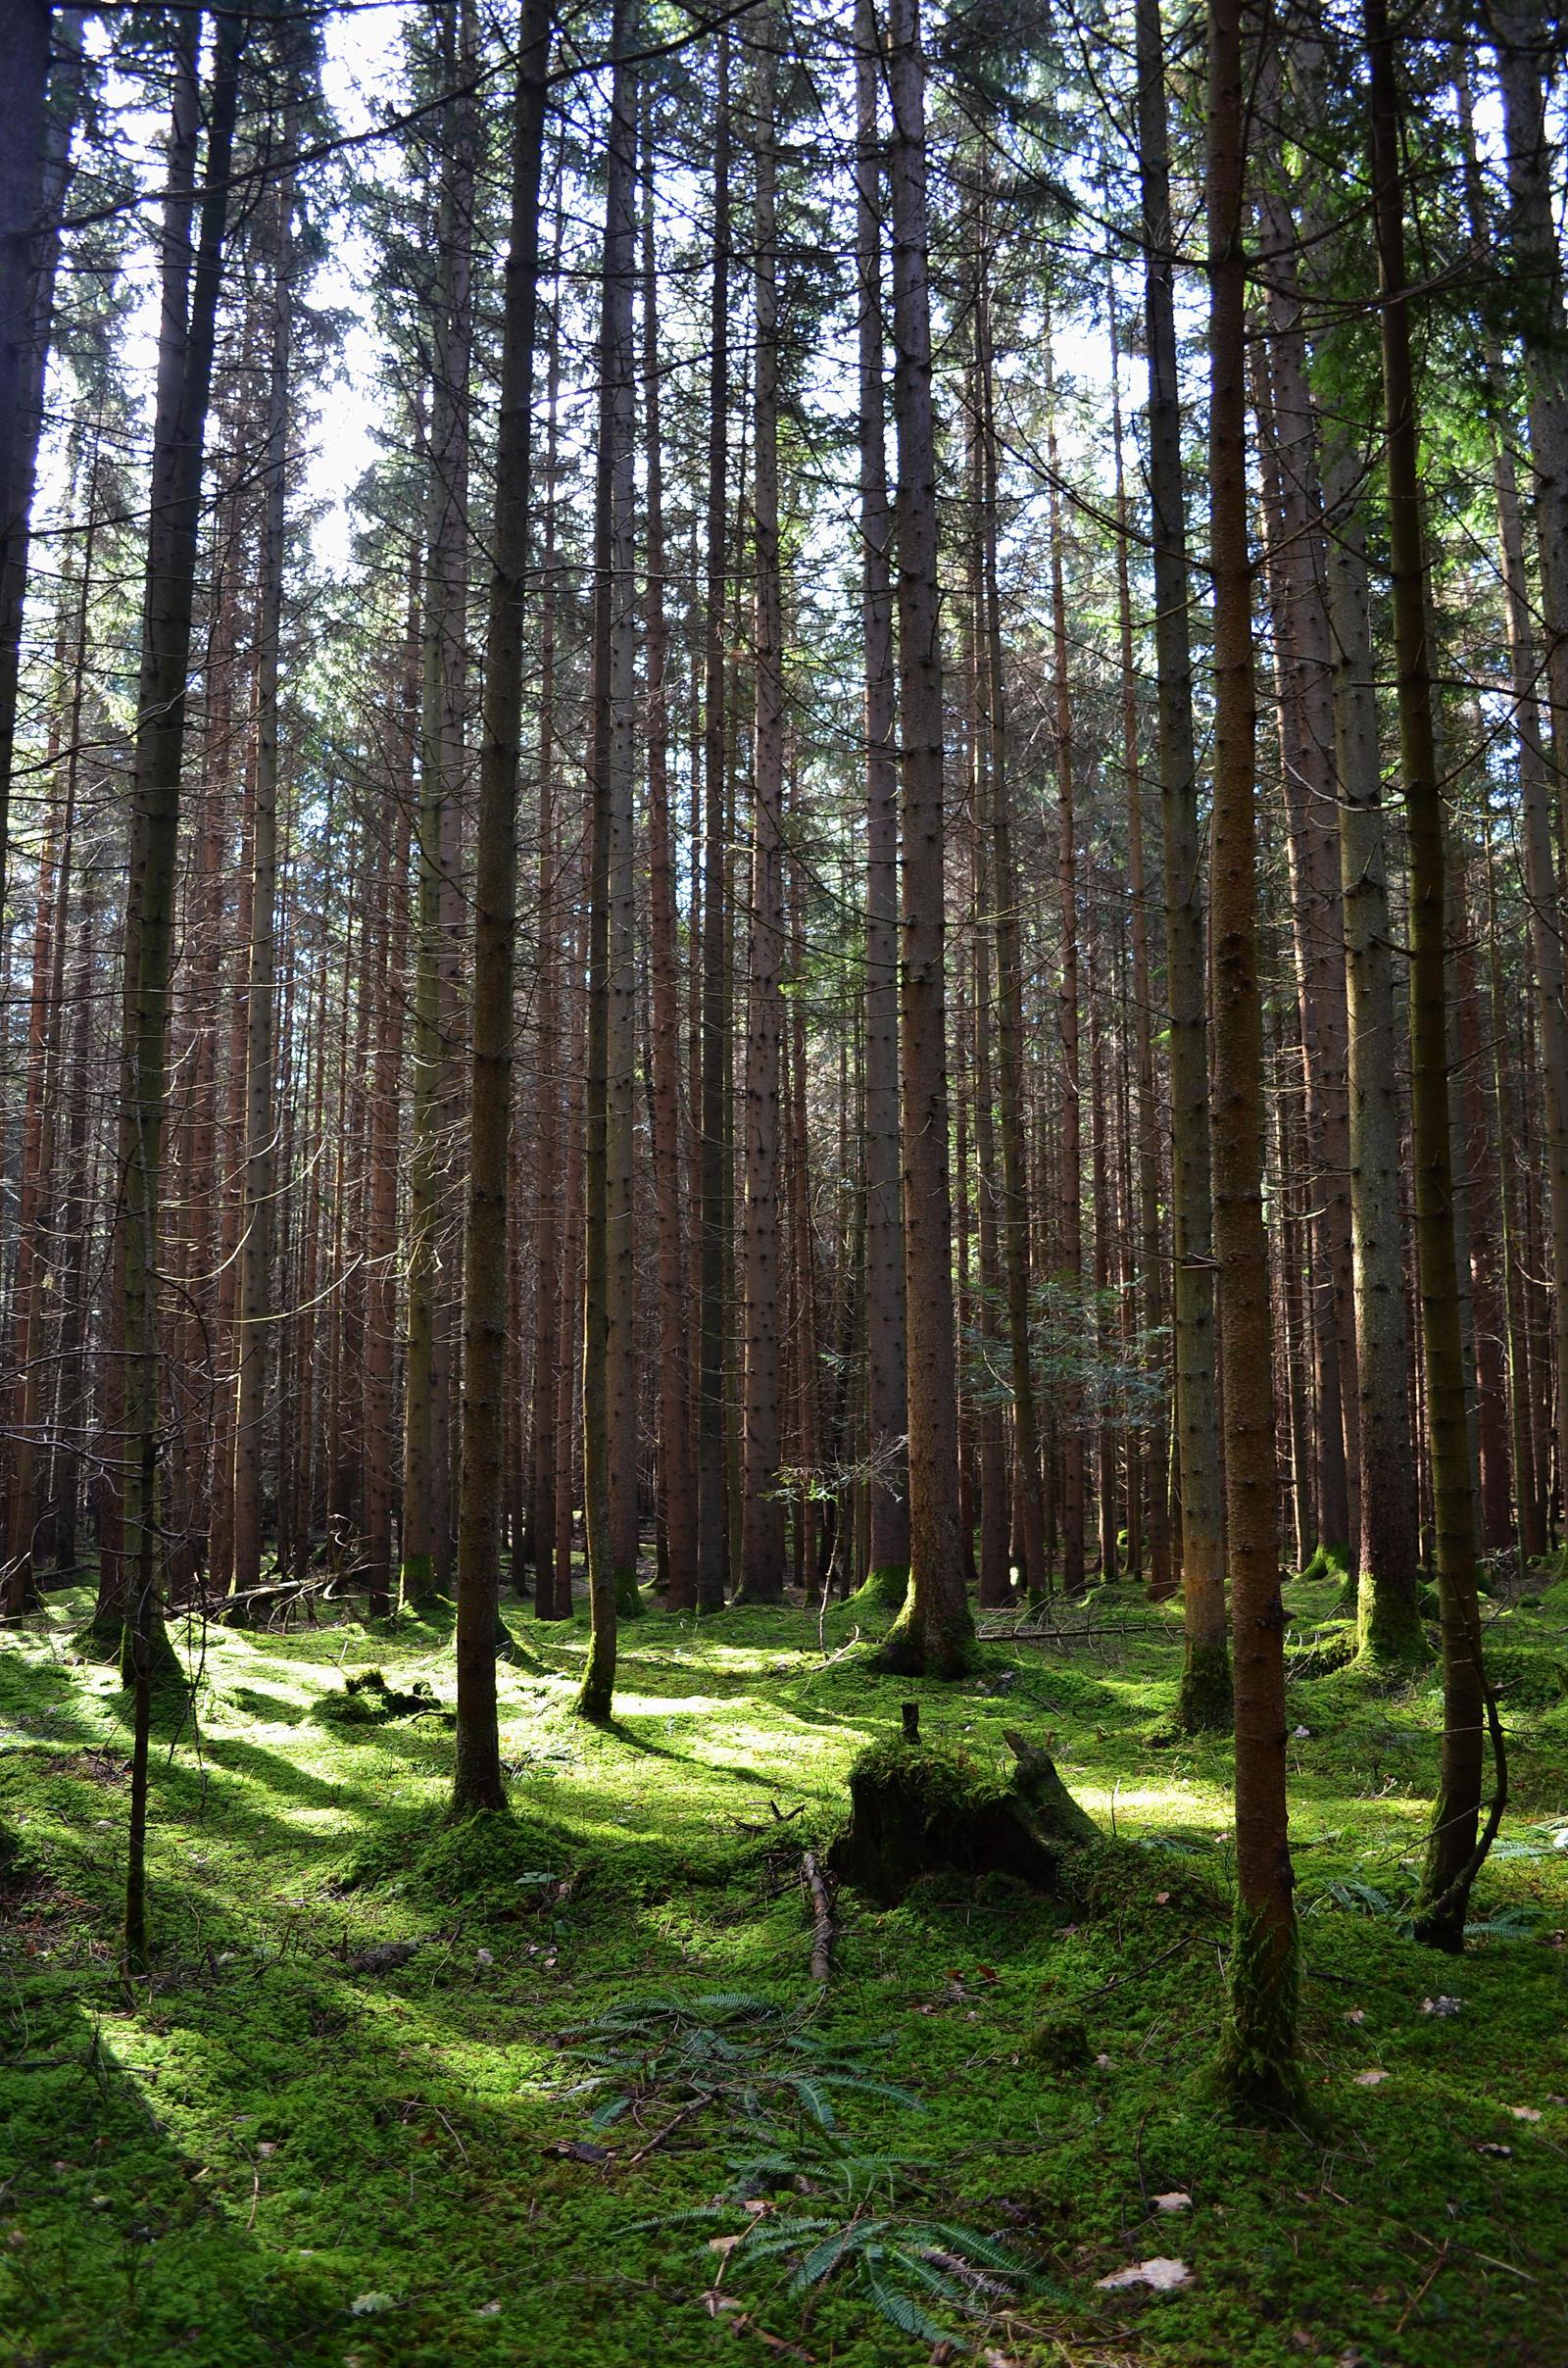 Forest Landscape Images - Reverse Search